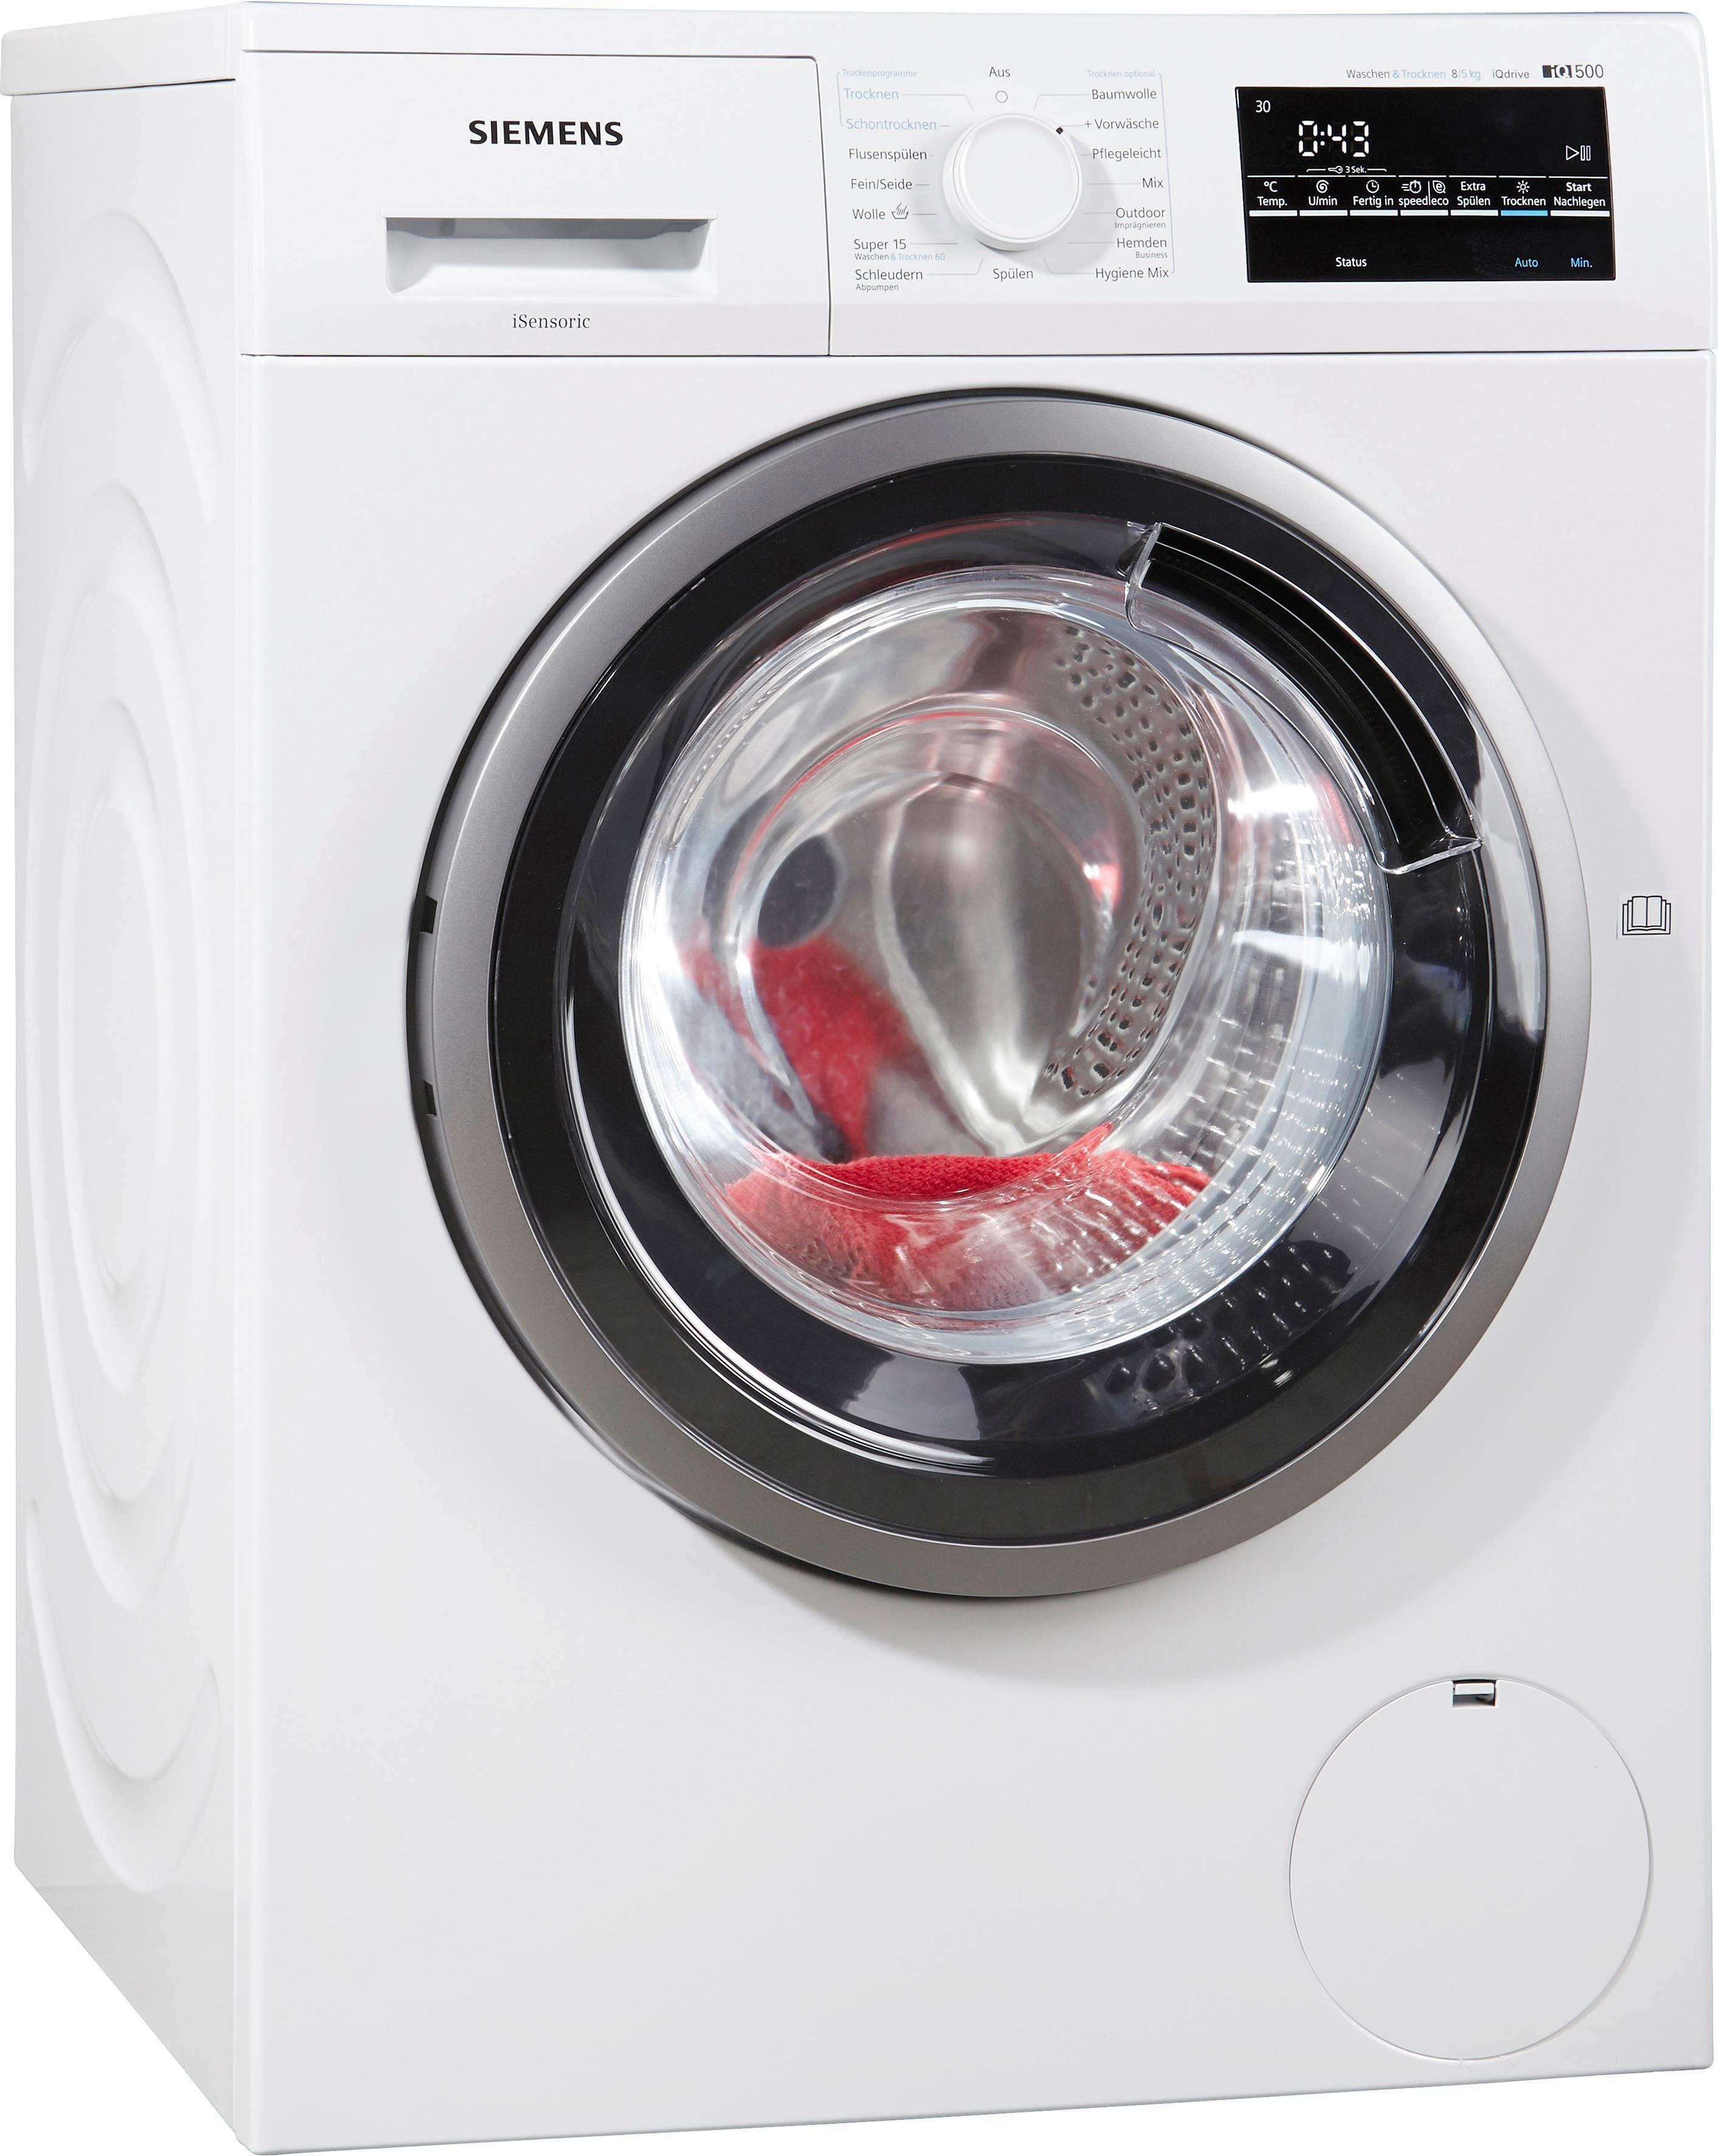 SIEMENS Waschtrockner iQ500 WD15G4V1, A, 8 kg / 5 kg, 1500 U/Min